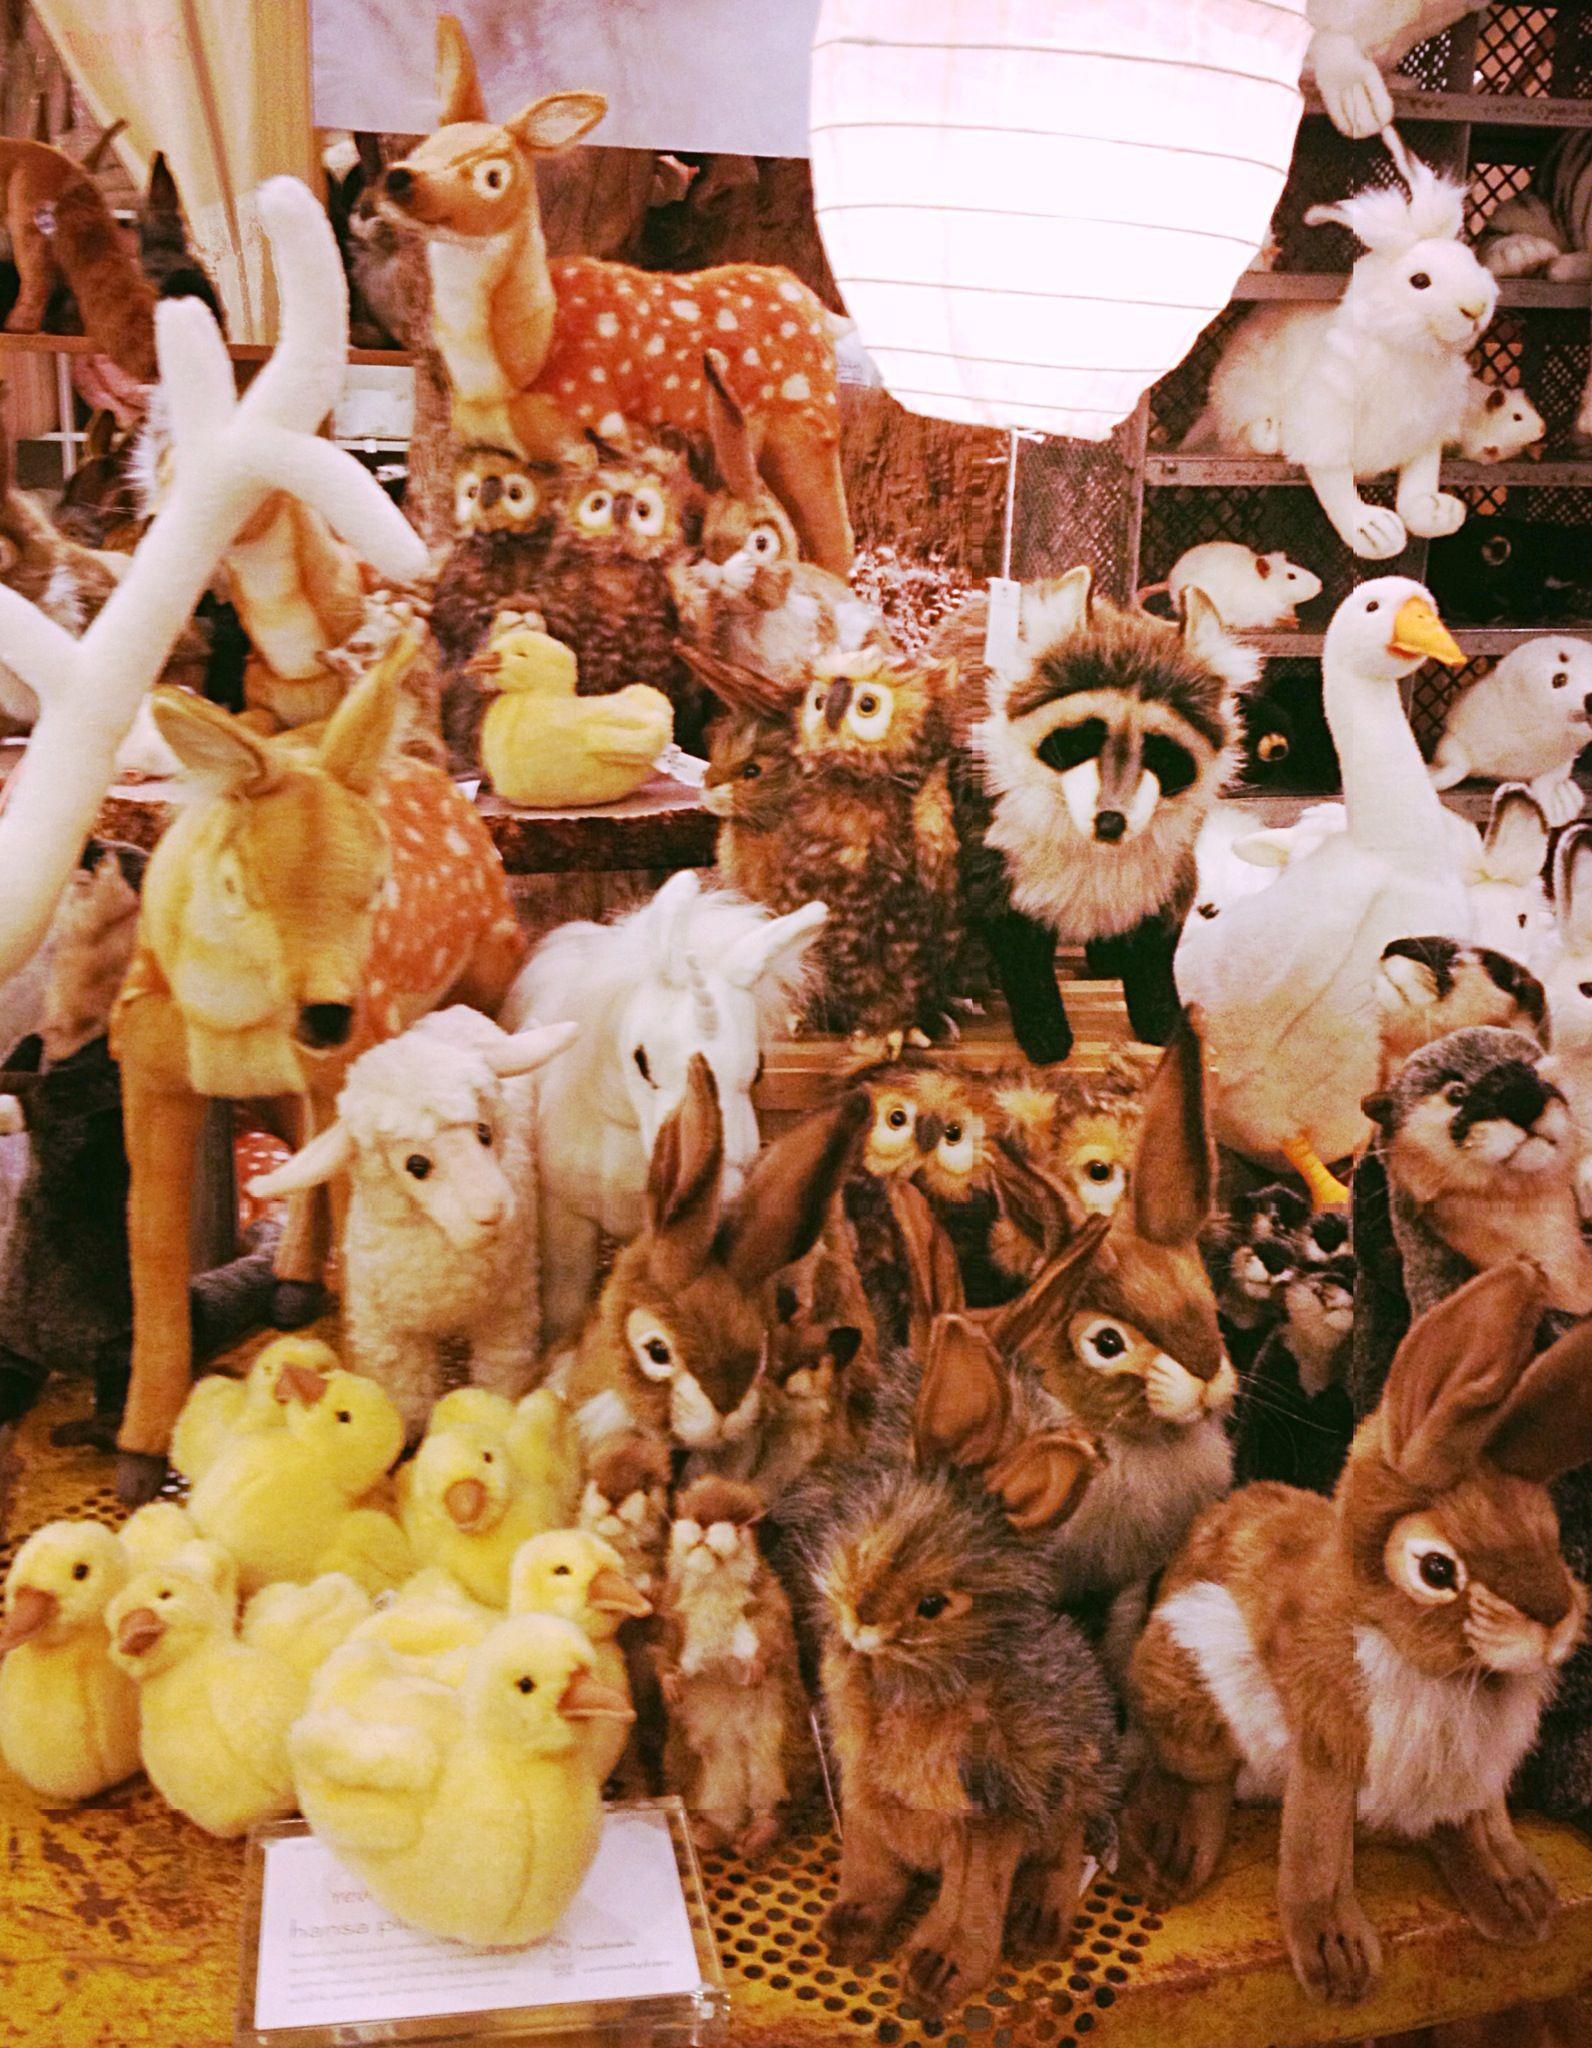 Stuffed animal display at ABC Home & Carpet Stuffed